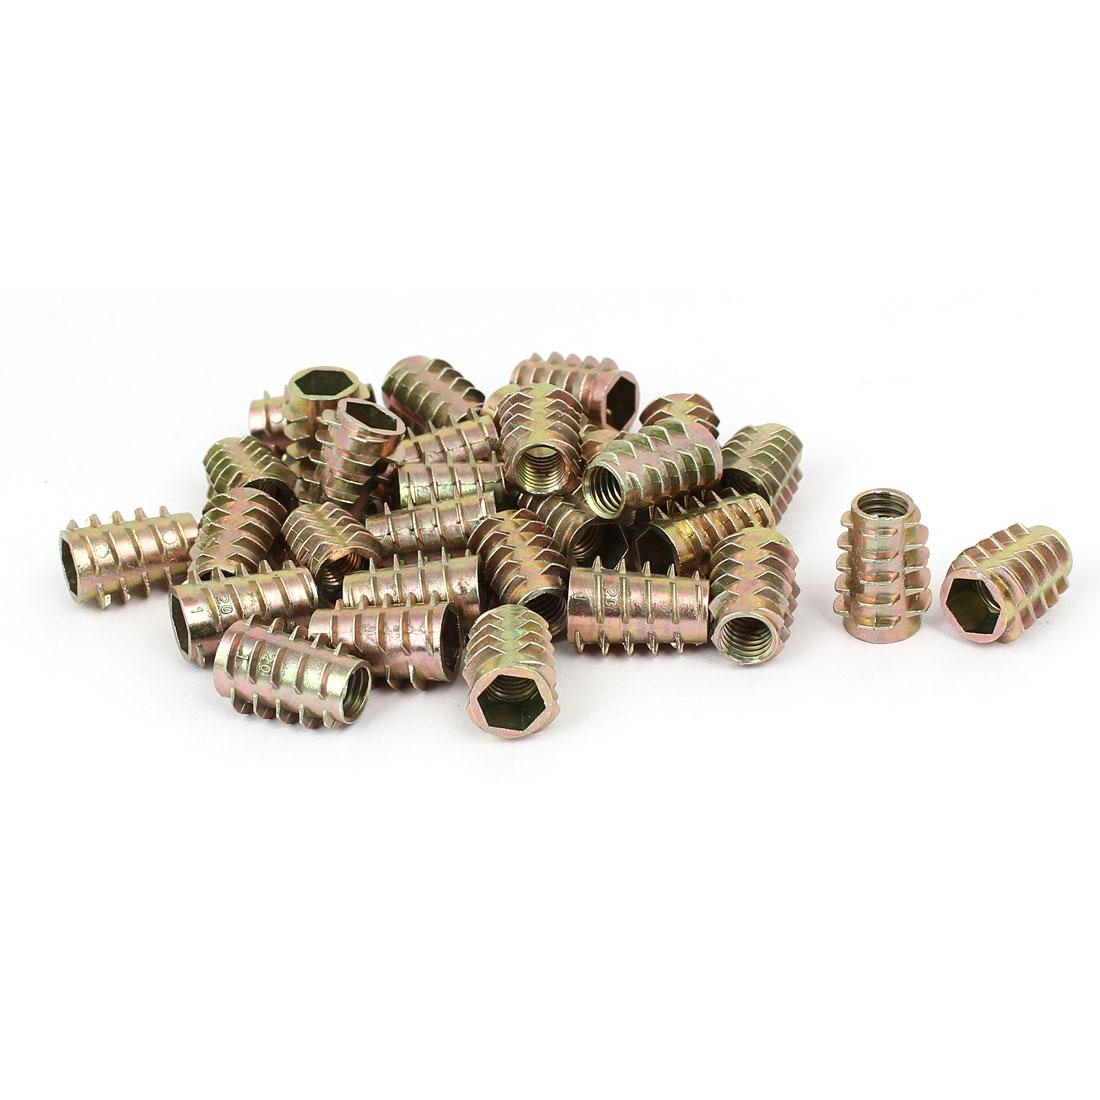 Wood Furniture Zinc Alloy Hex Socket Insert Screws E-Nuts M8x20mm 30pcs